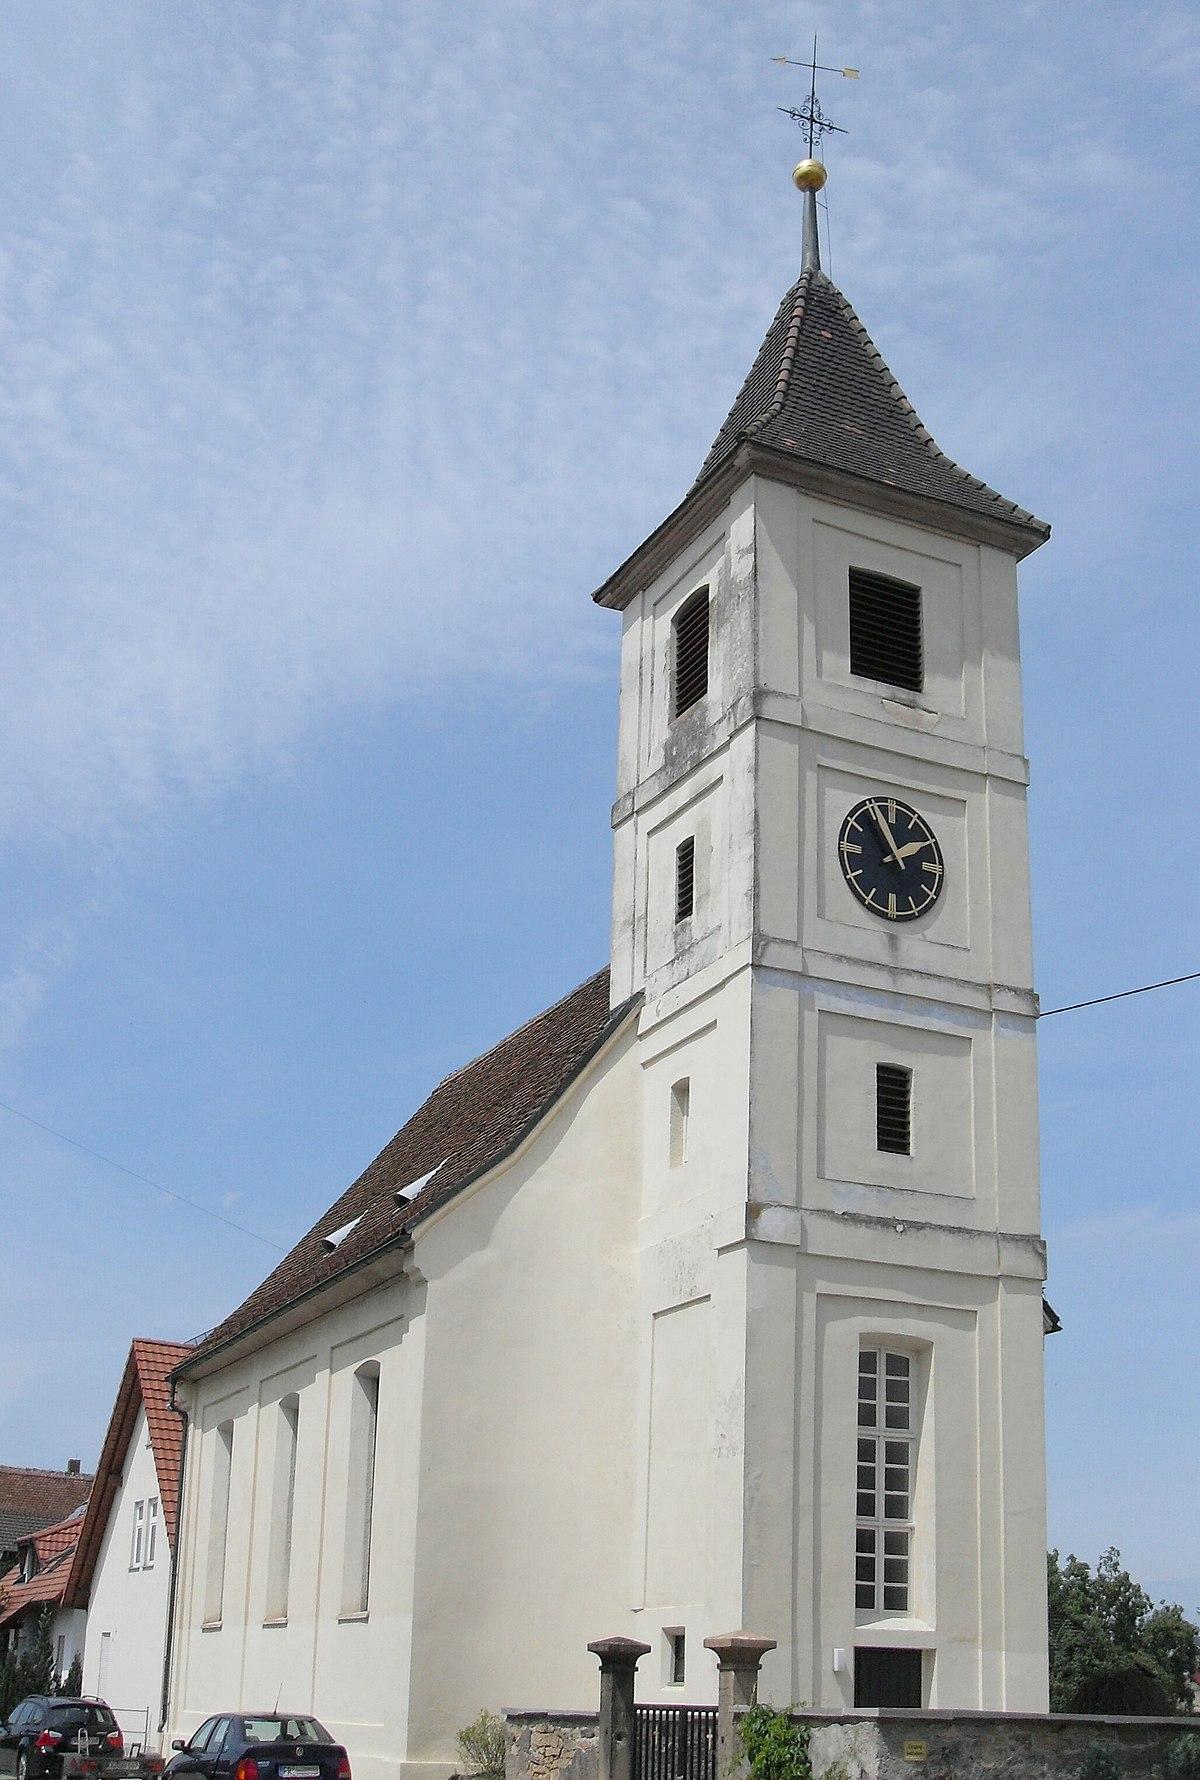 1200px-Seefelden_%28Gemeinde_Buggingen%29%2C_Kirche Freiburg on basel mulhouse, keidel bad, germany history, zürich, im breisgau map, lake constance, black forest, germany tourism,